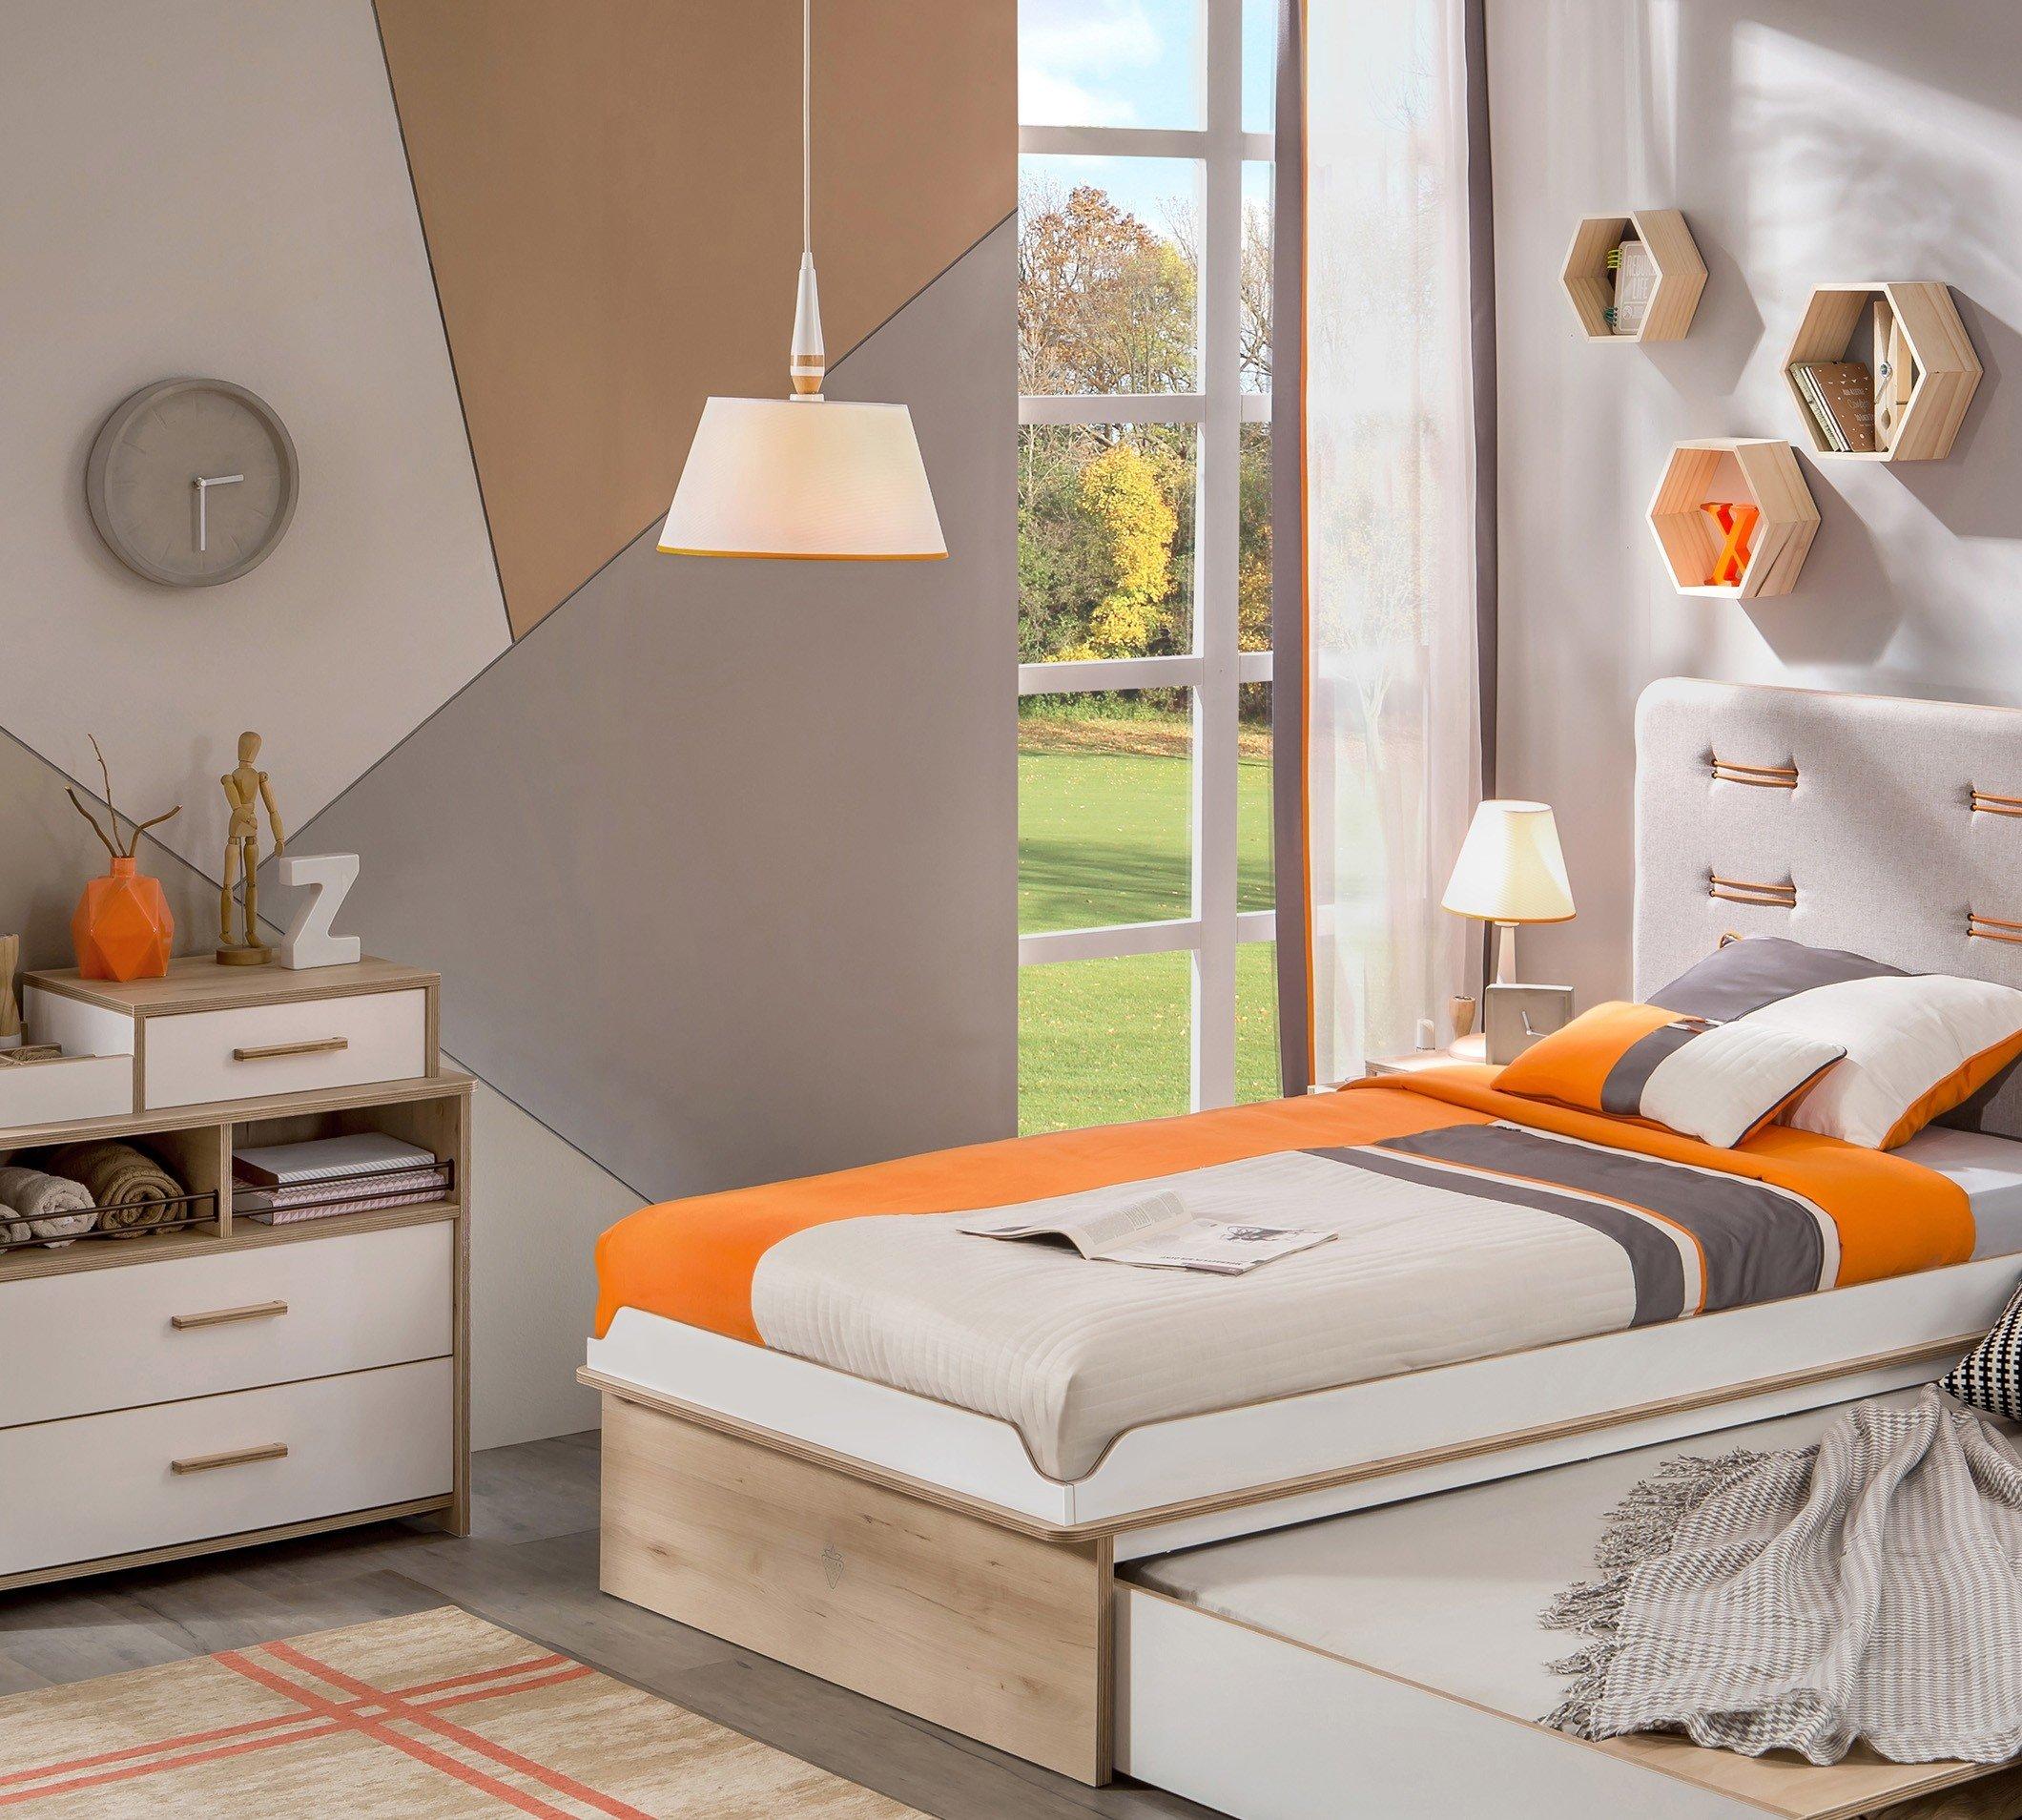 cilek dynamic deckenlampe bei panda kinderm bel. Black Bedroom Furniture Sets. Home Design Ideas